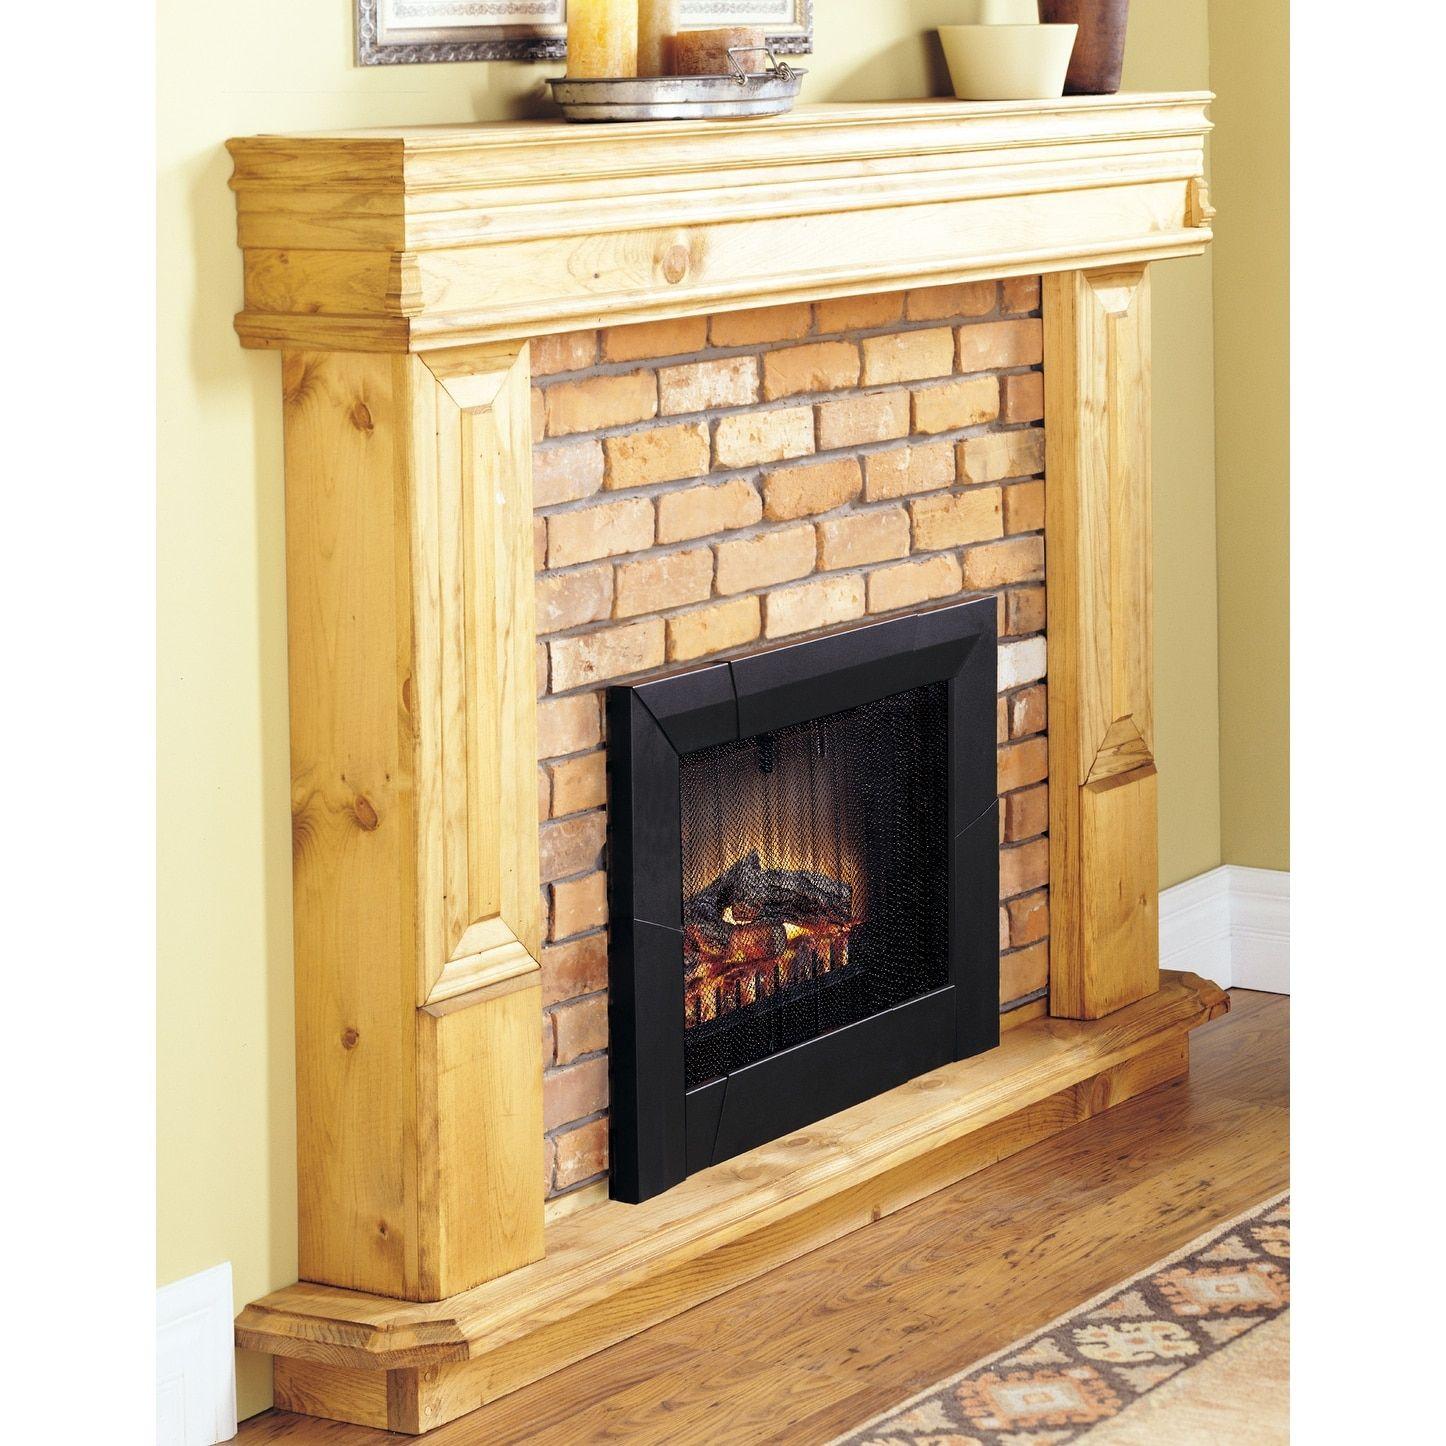 Dimplex DFI23TRIMX Electric Fireplace Insert Expandable Trim Kit ...